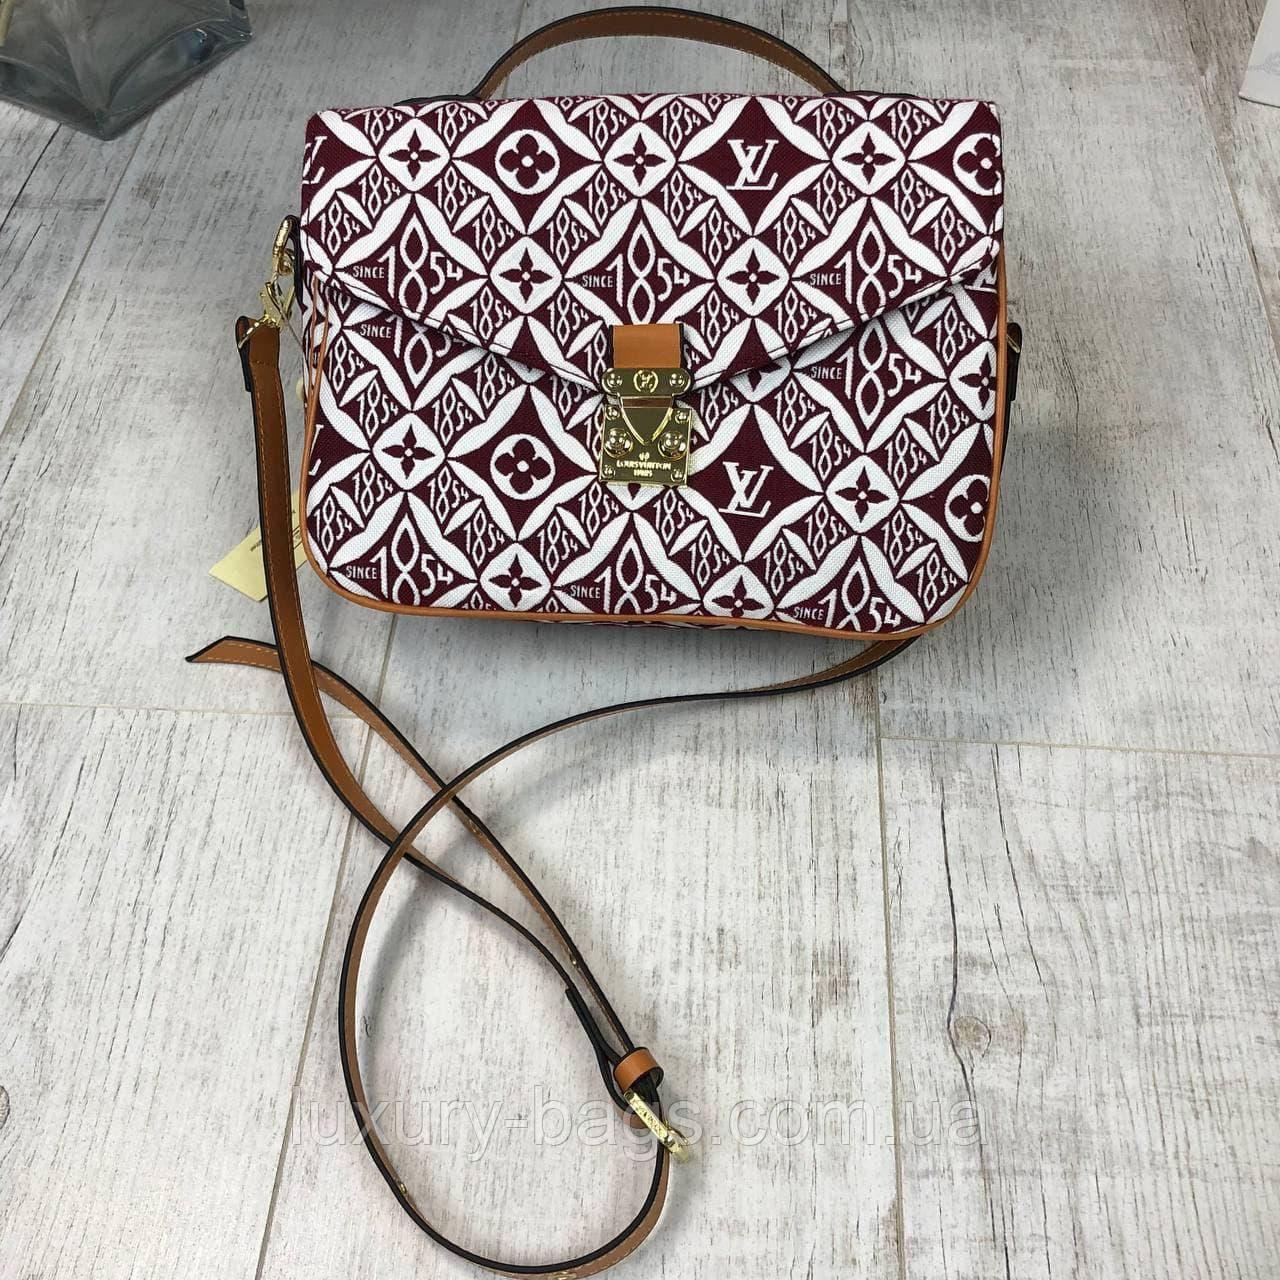 Жіноча сумка Louis Vuitton Pochette Metis Since 1854